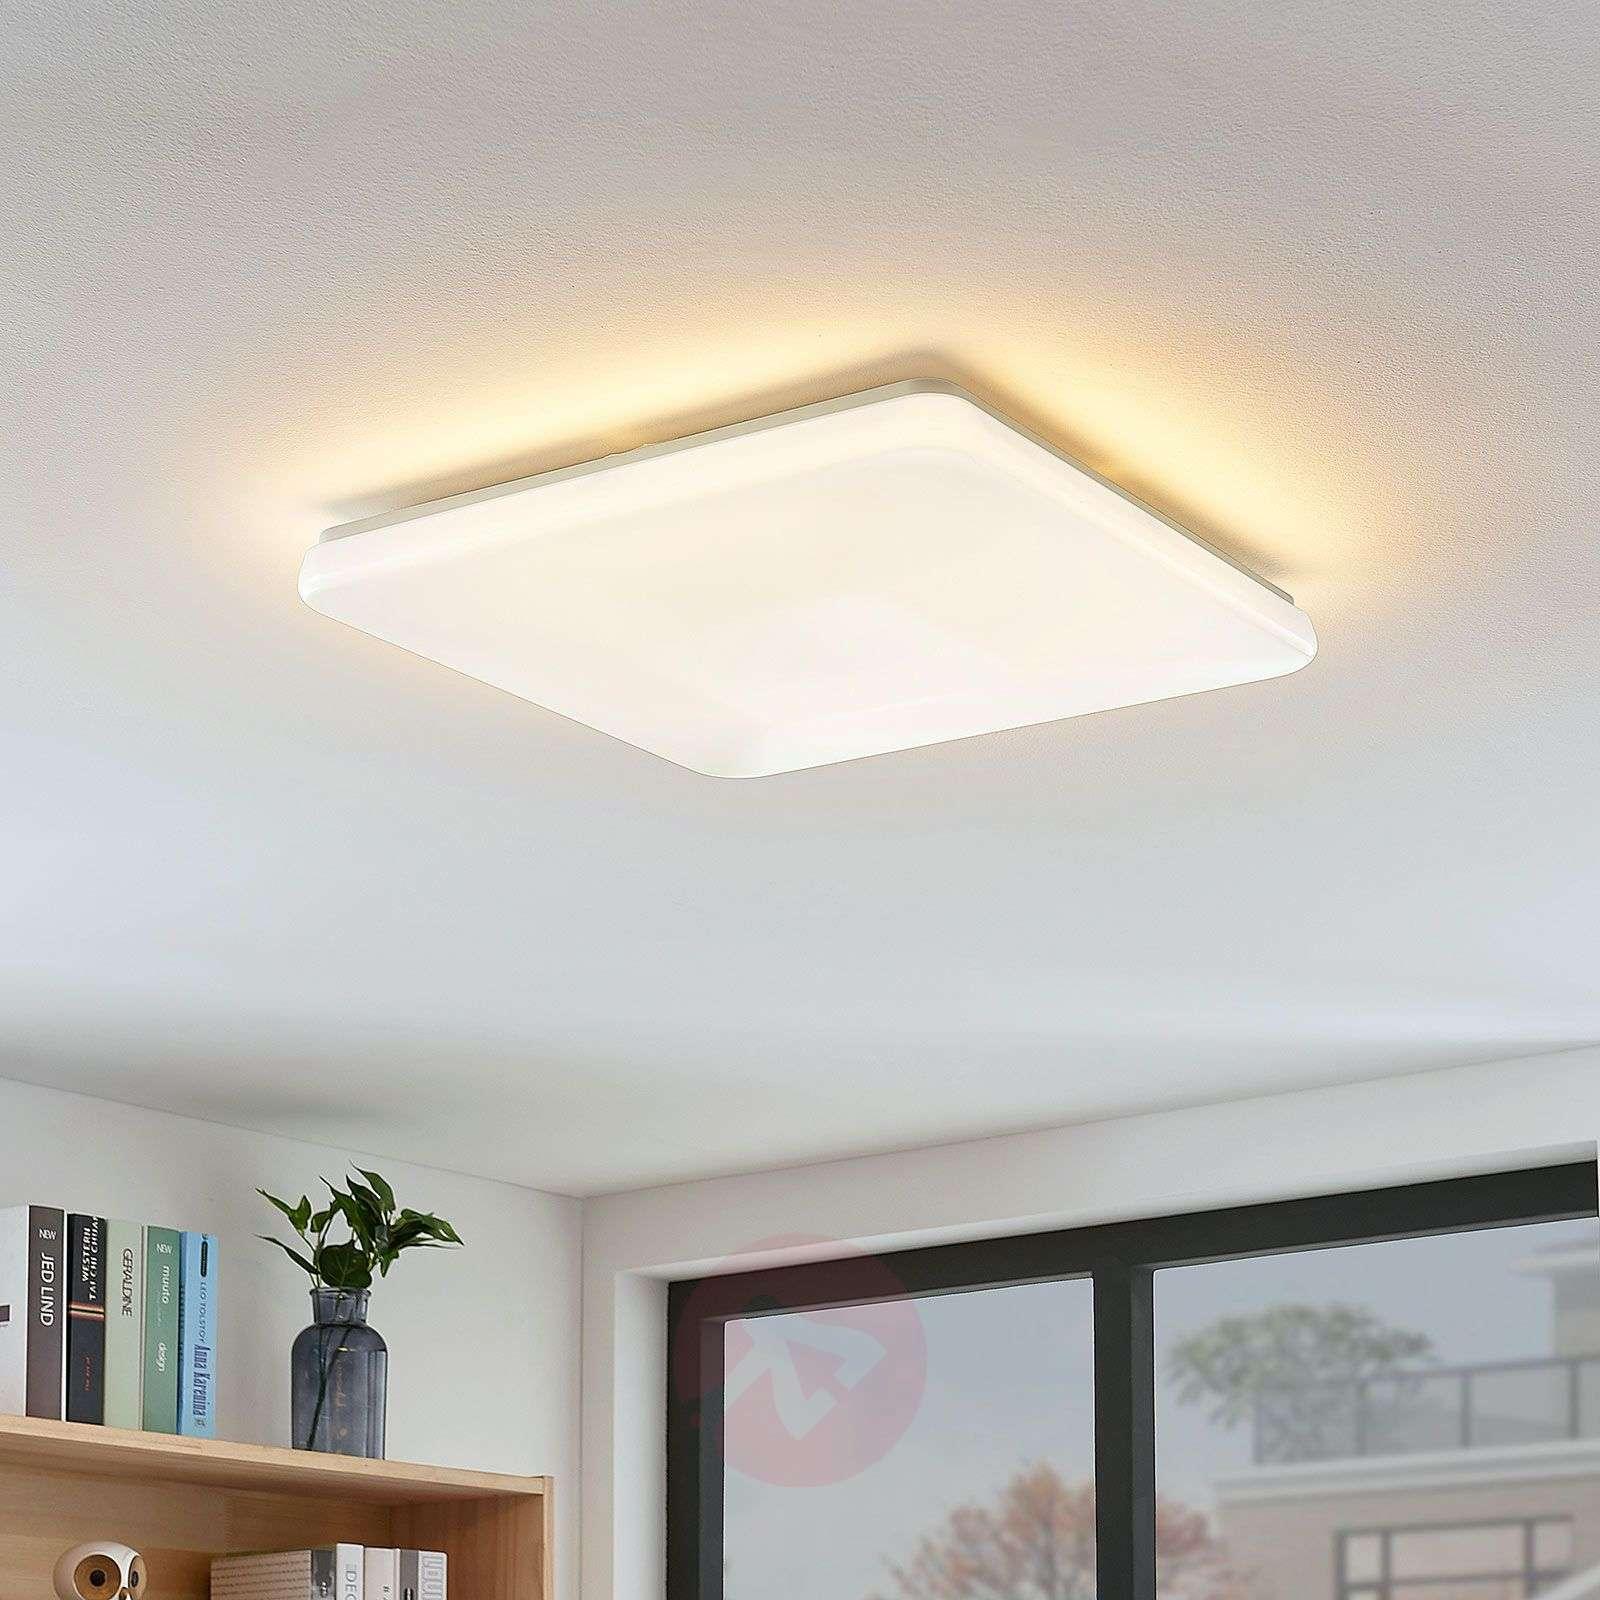 LED-kattovalaisin Indika värin vaihto CCT kulmikas-9624585-01